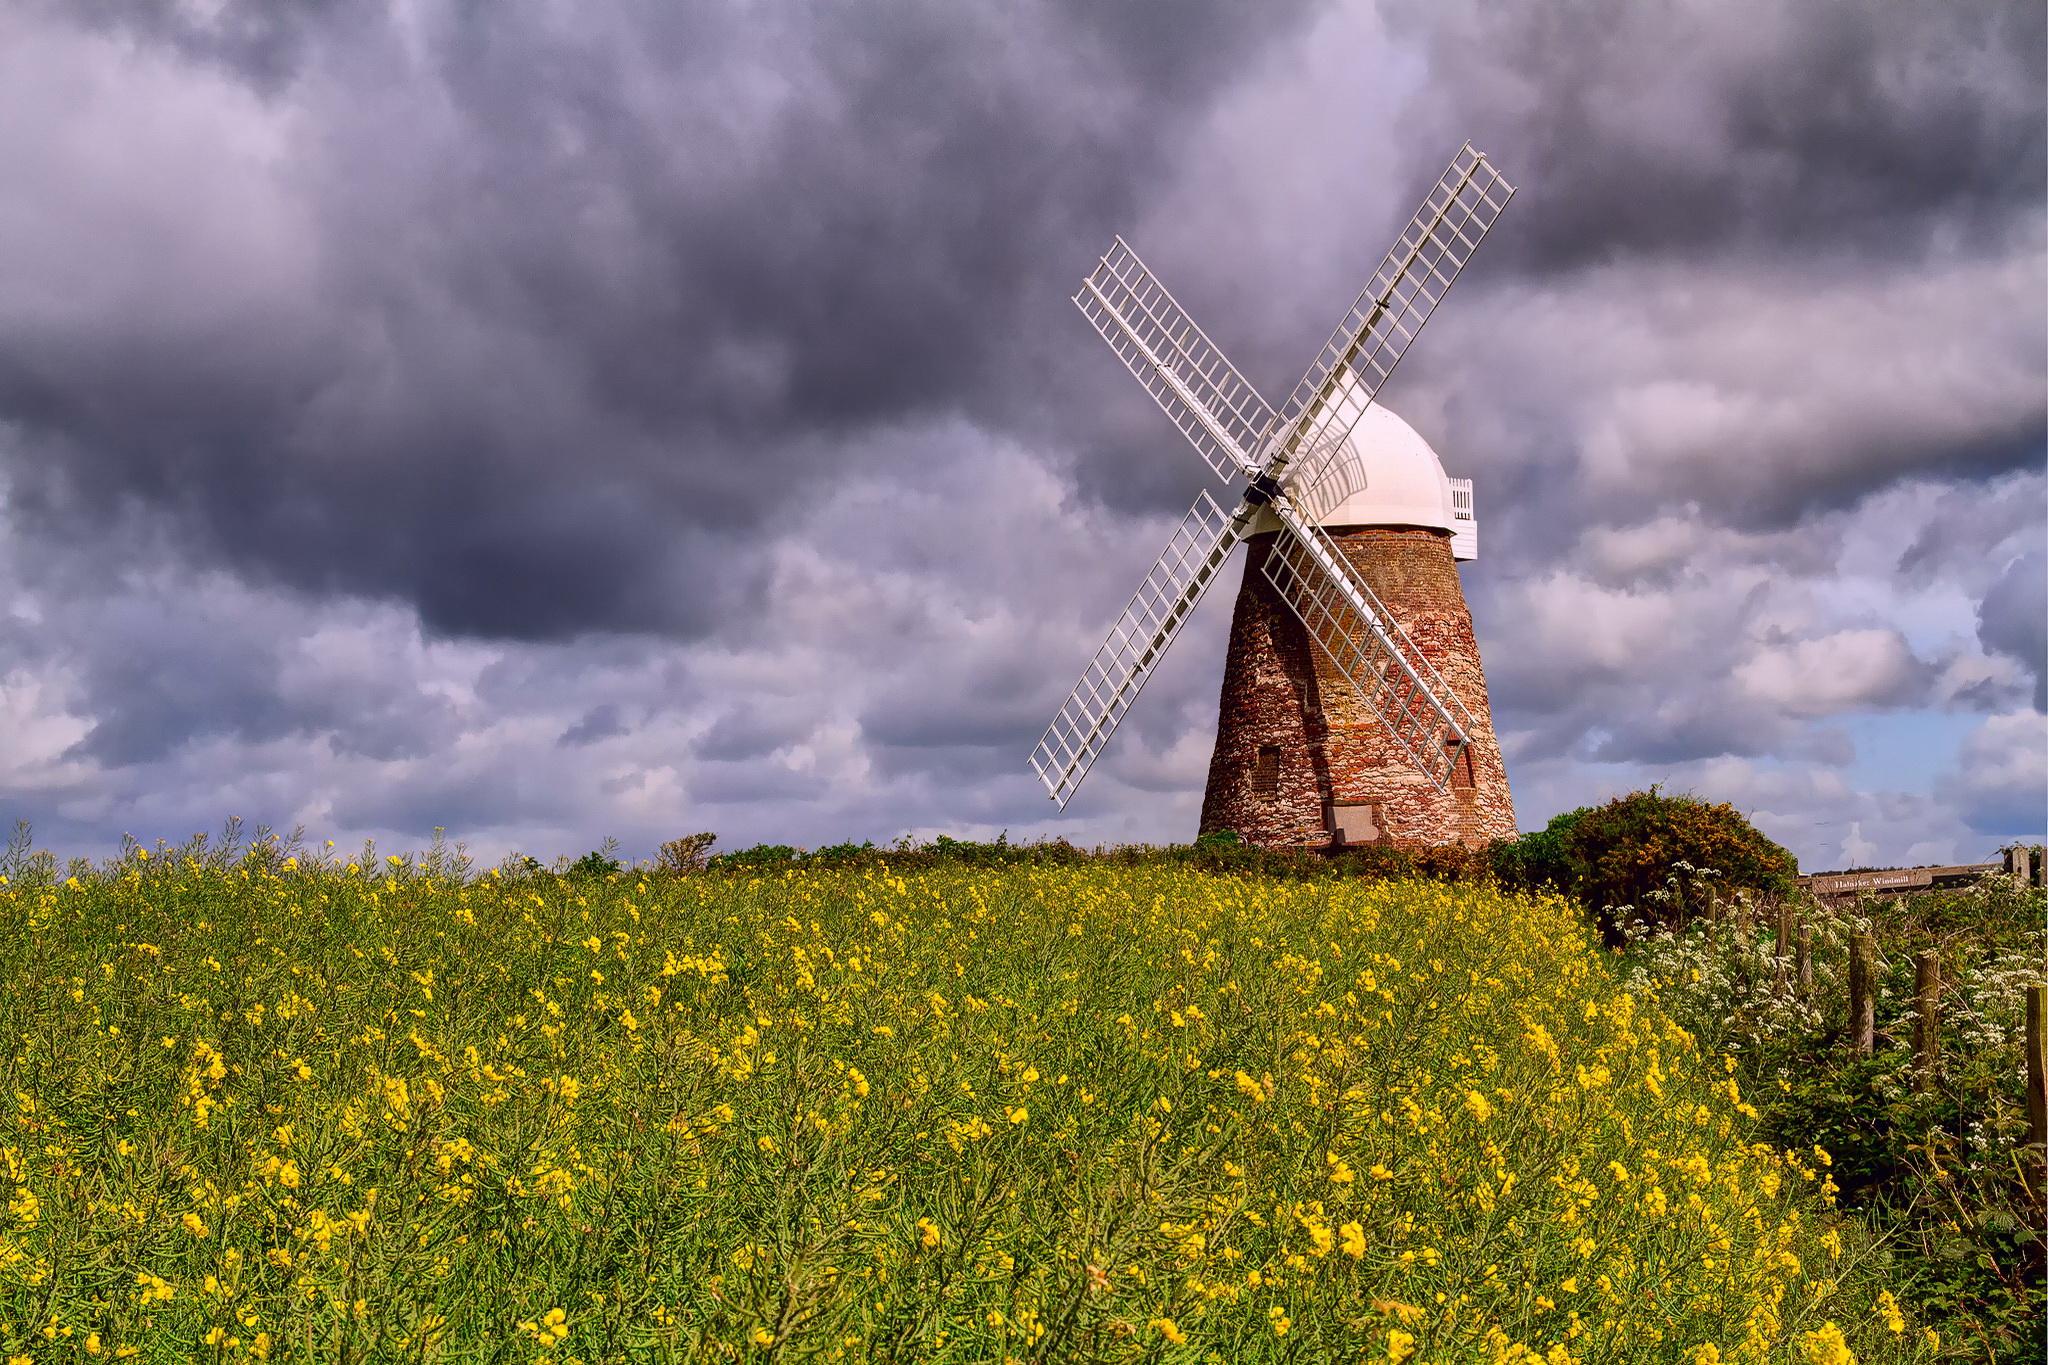 Brick windmill / 2048 x 1365 / Other / Photography | MIRIADNA.COM